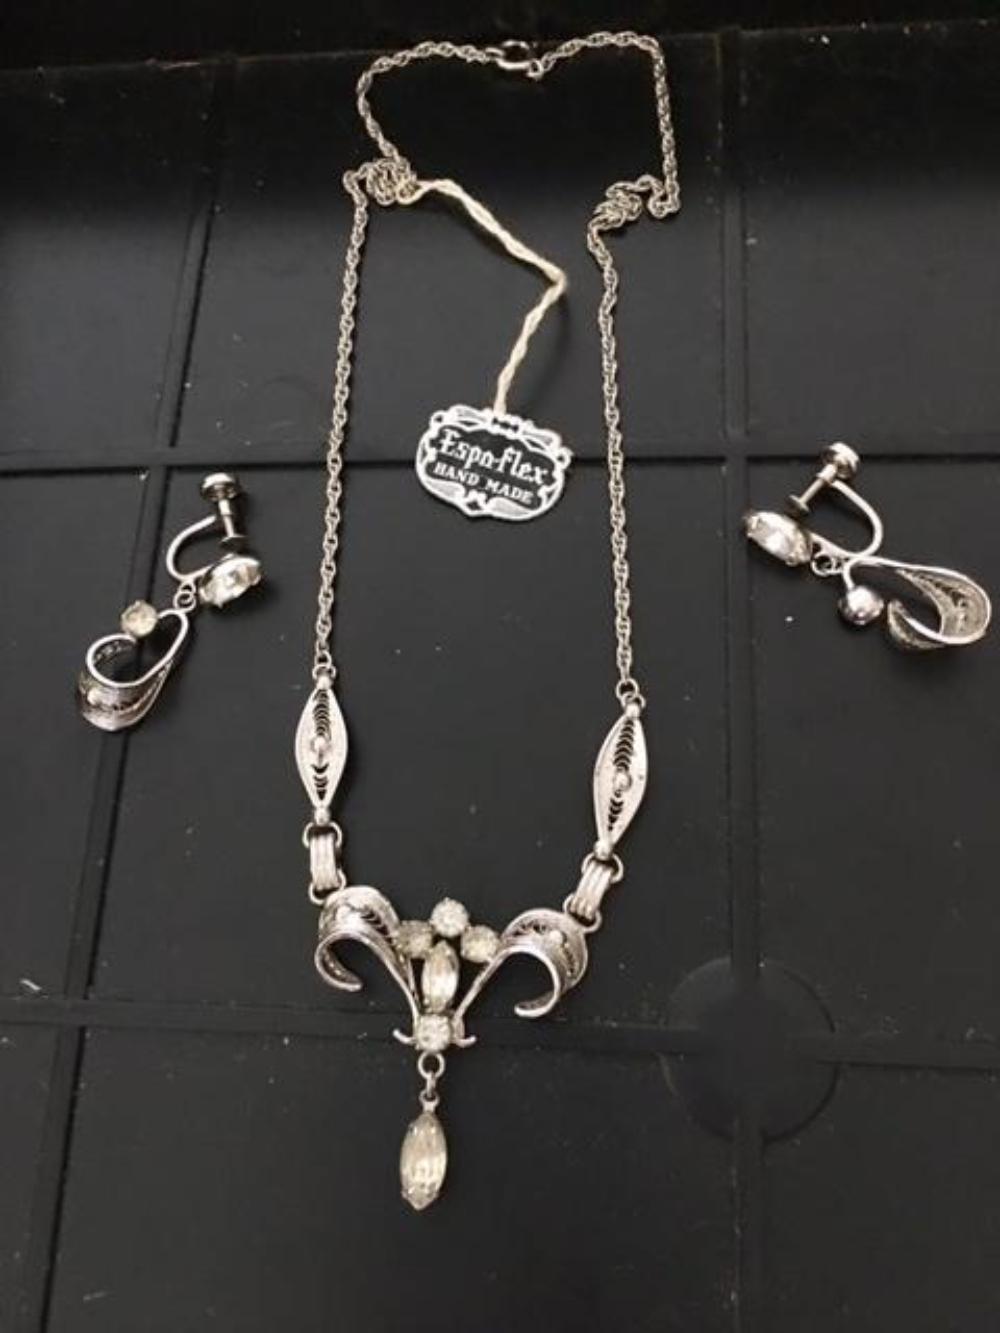 Vintage Sterling Silver Espo Set Necklace Earrings